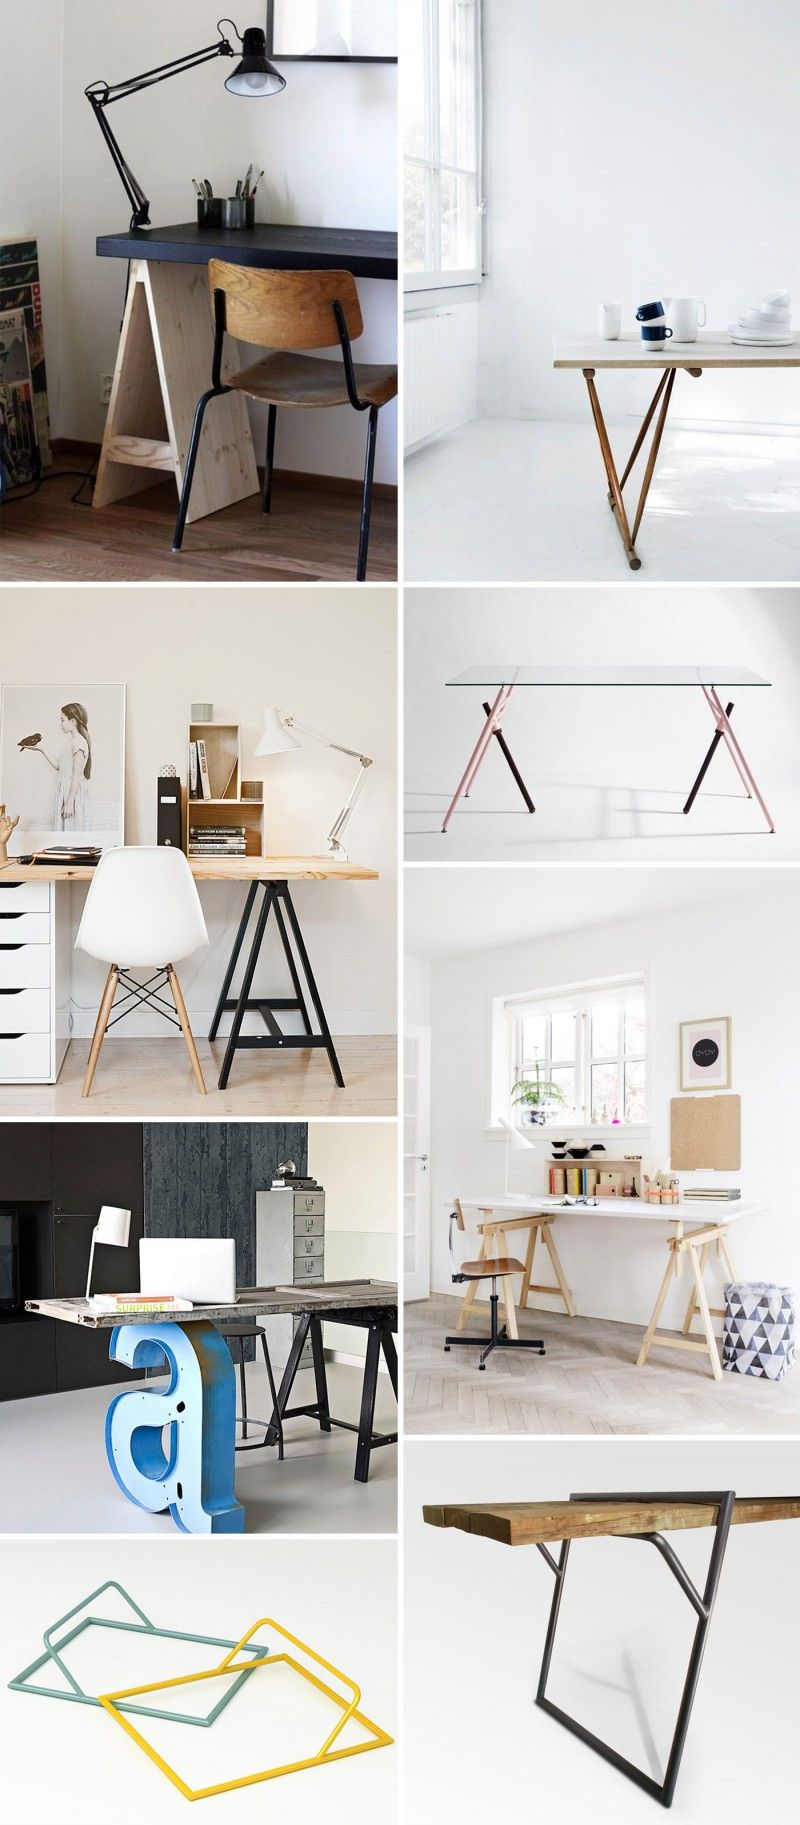 tr teaux 39 id es d co pour cr er une table ou un bureau home sweet home schreibtisch. Black Bedroom Furniture Sets. Home Design Ideas